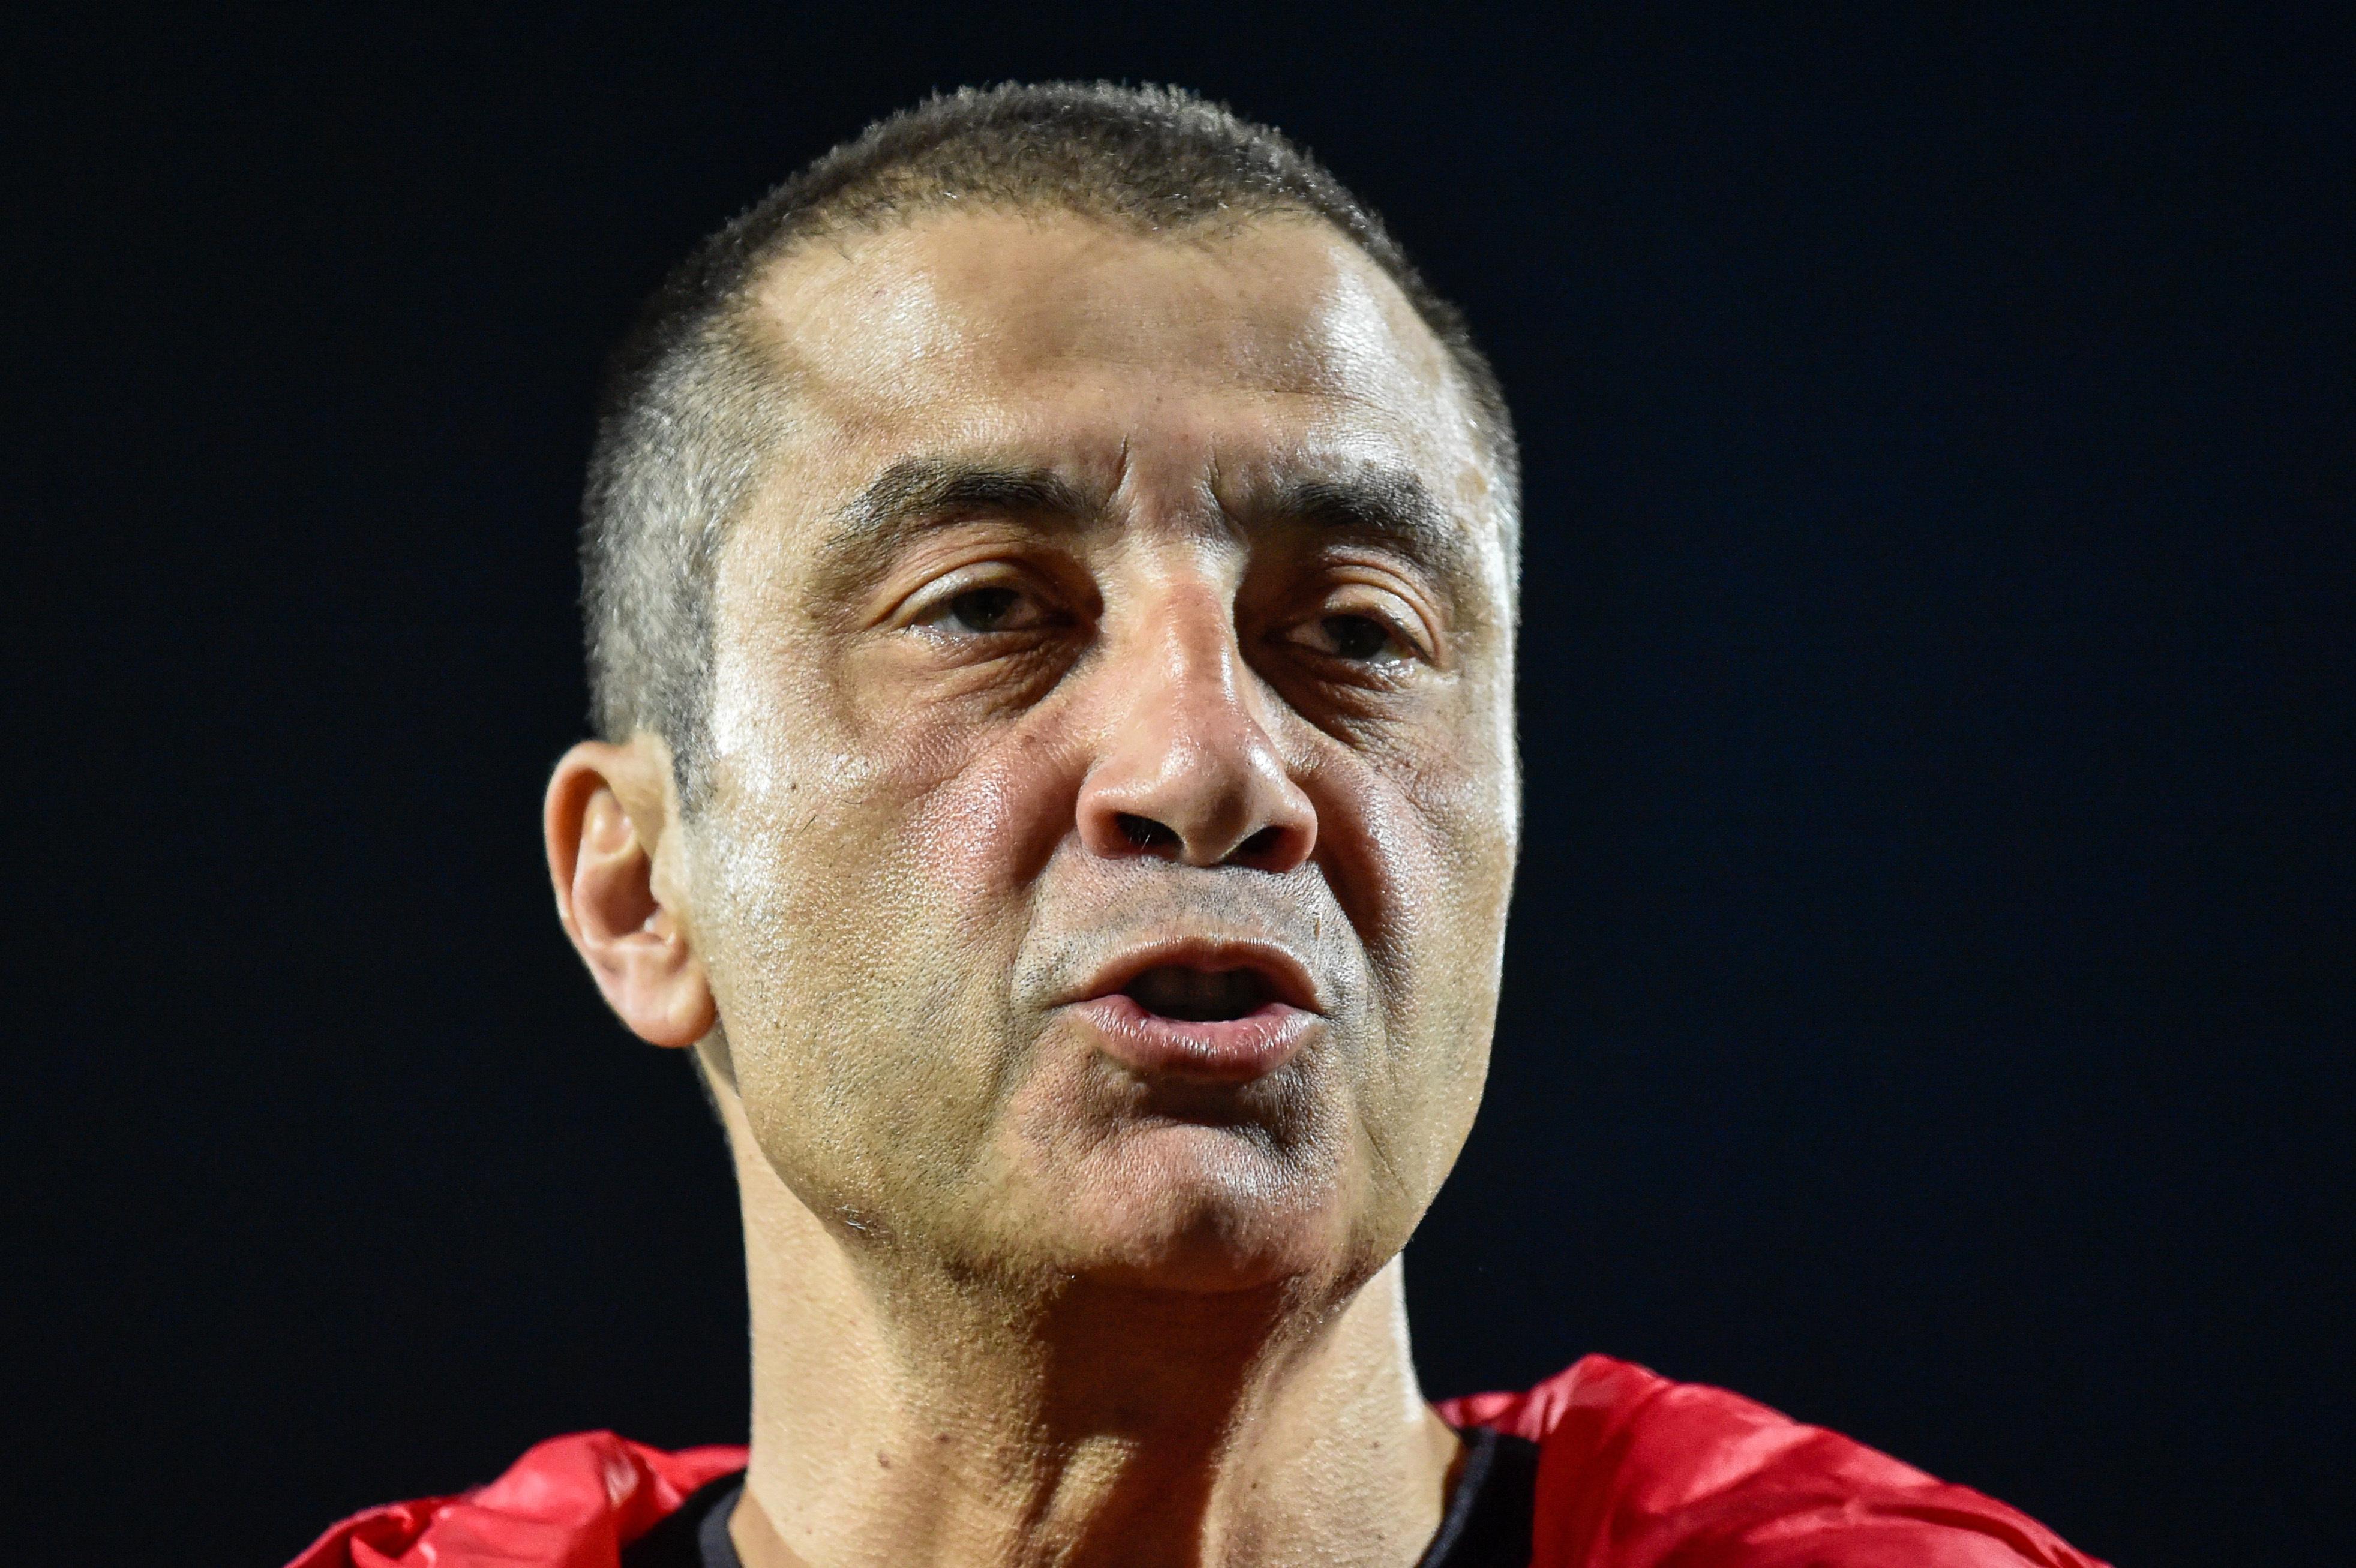 Rugby - Coupes d'Europe - Boudjellal : «Les chiens sont sortis pour nous aboyer dessus»